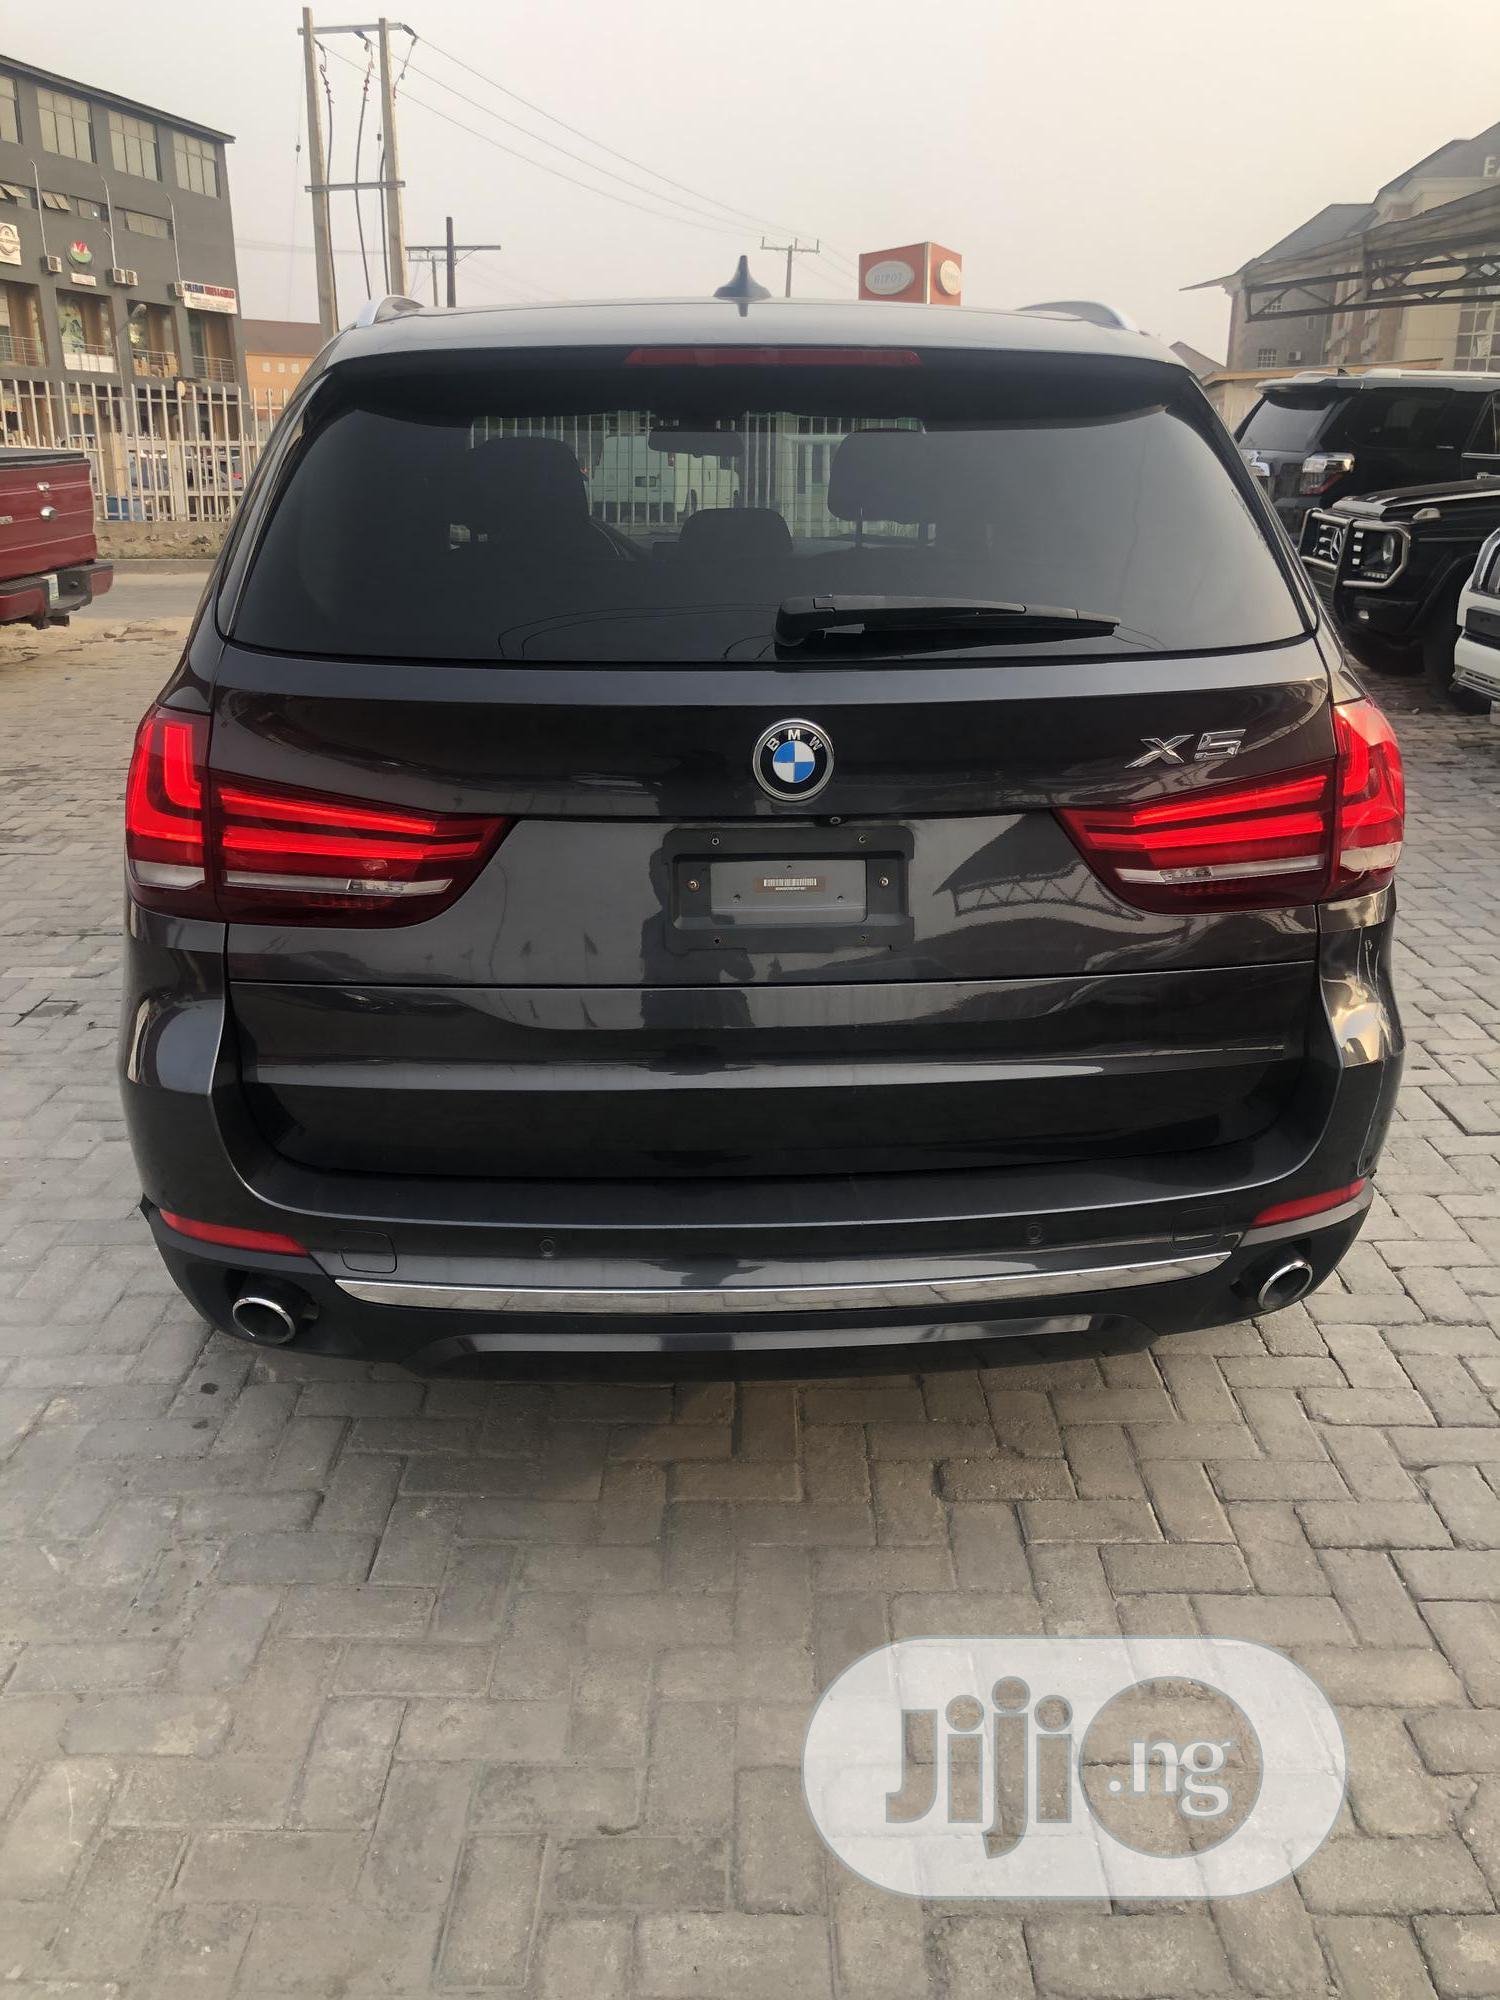 BMW X5 2014 Gray | Cars for sale in Lekki, Lagos State, Nigeria